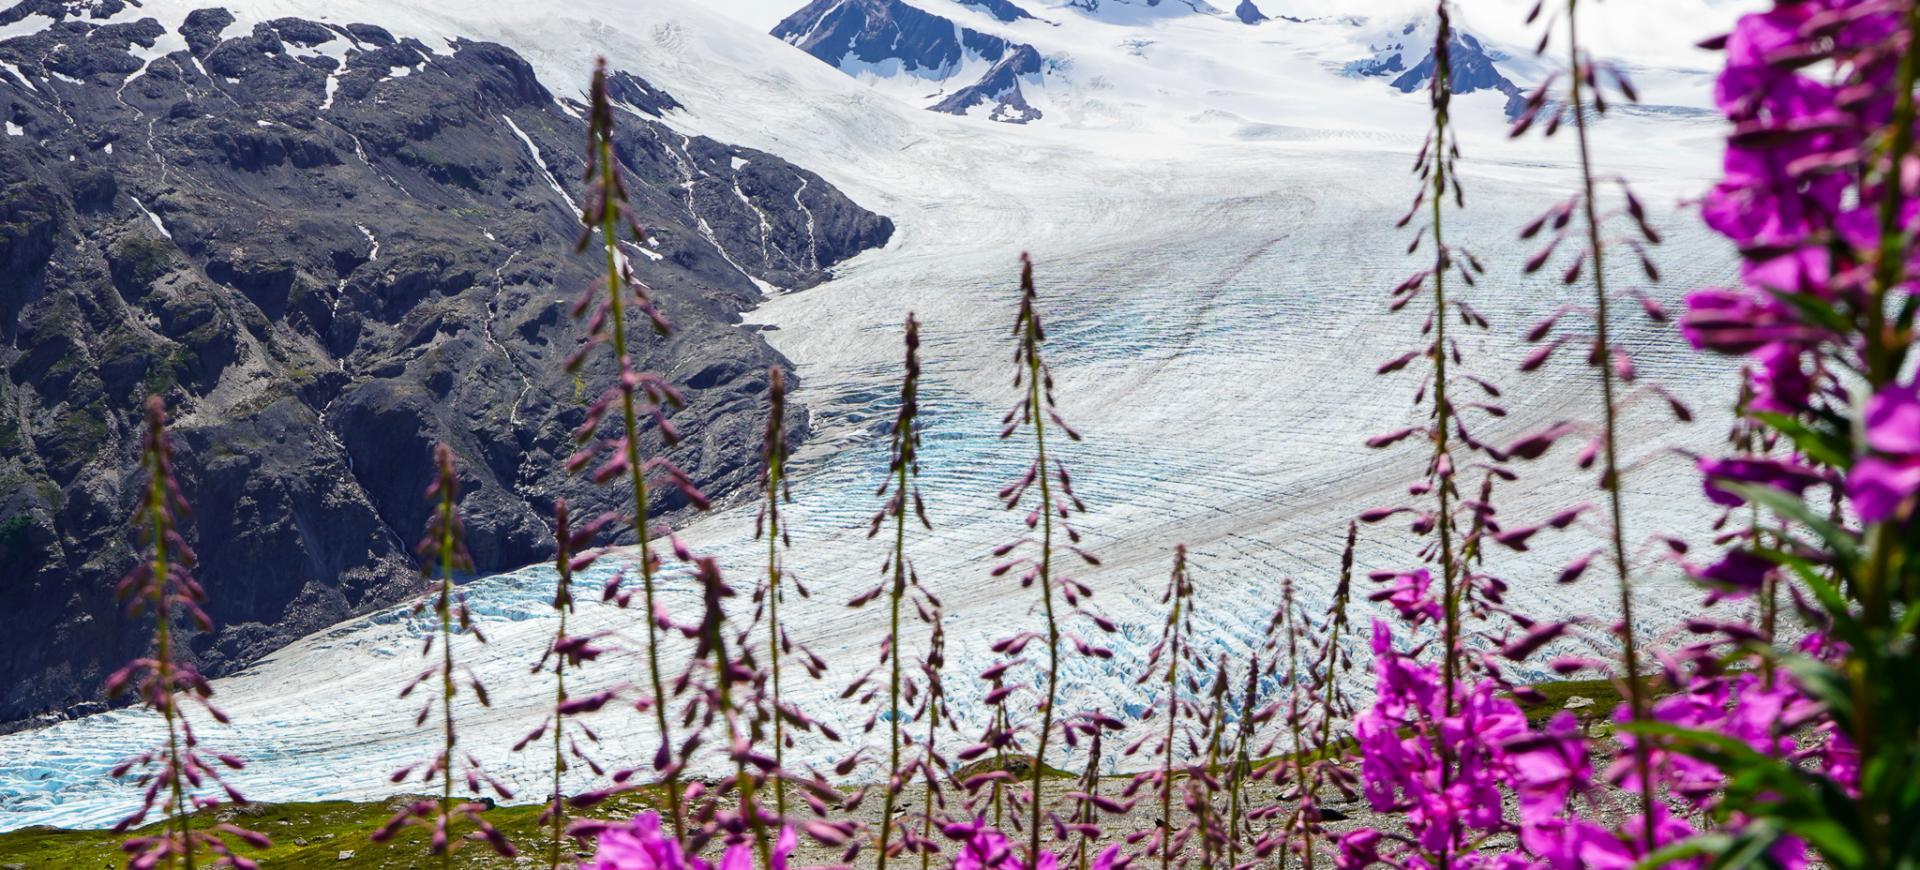 lodowiec-exit-alaska